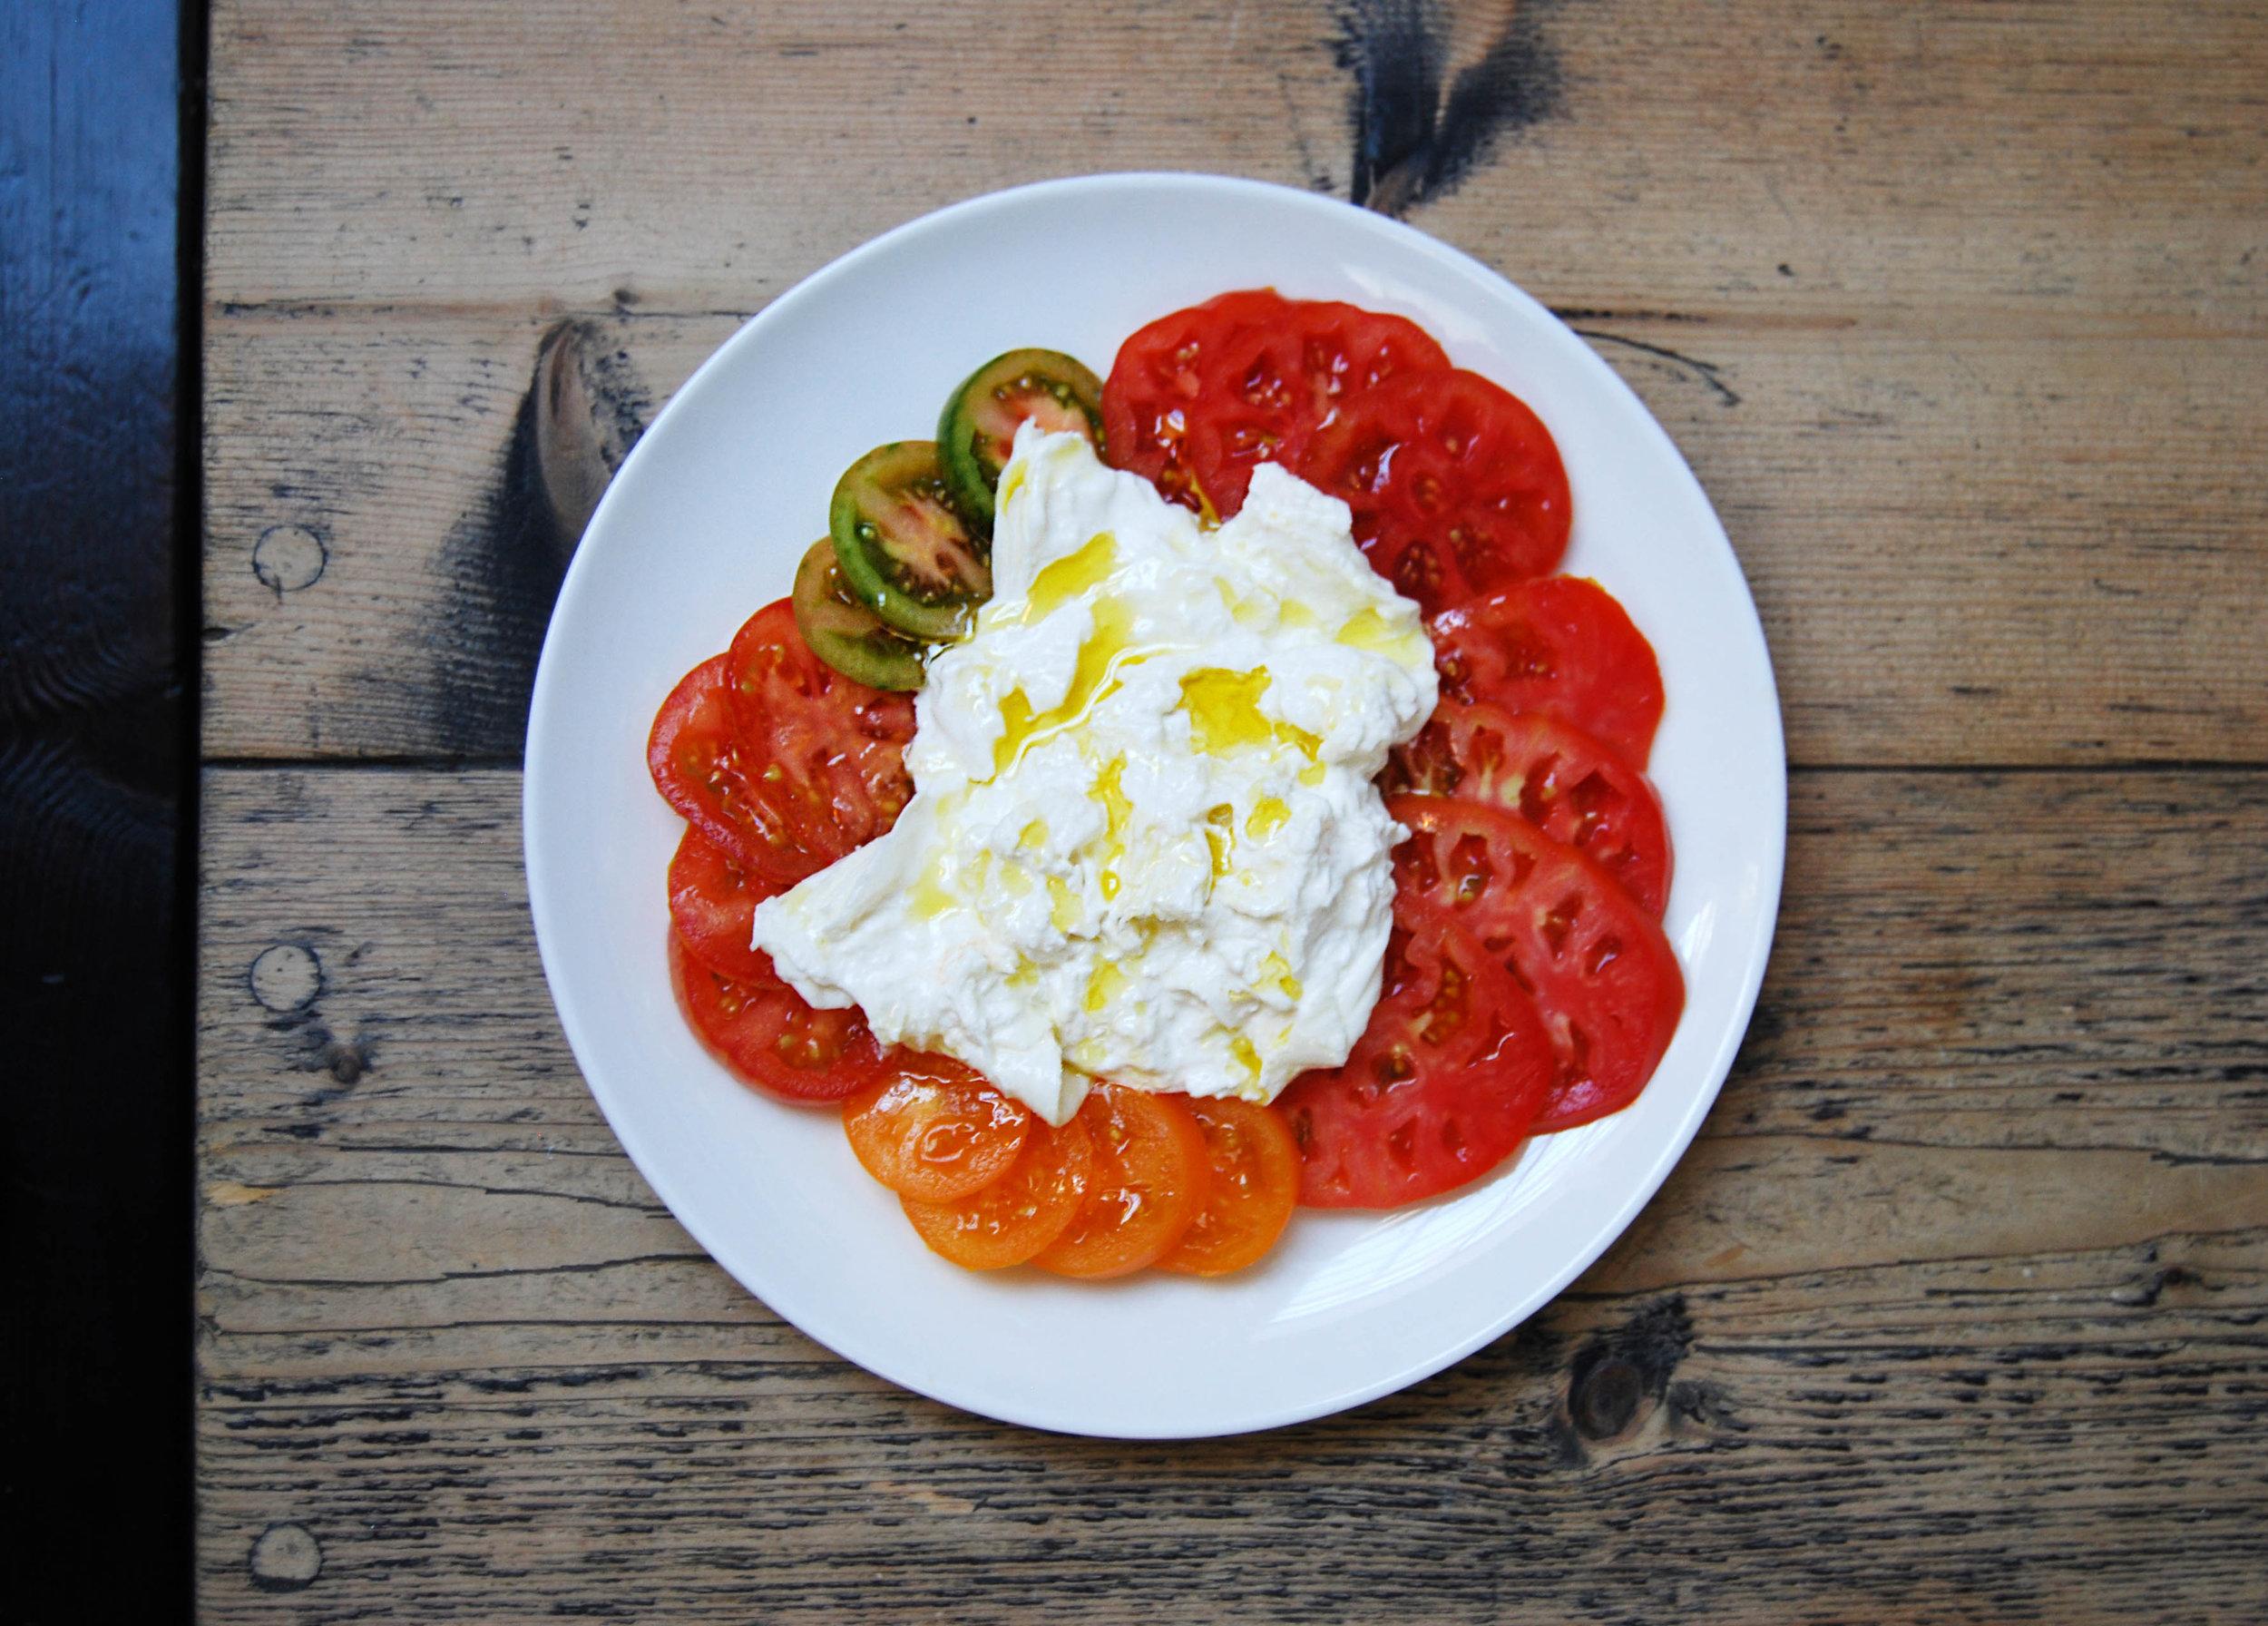 burrata & tomatoes web.jpg